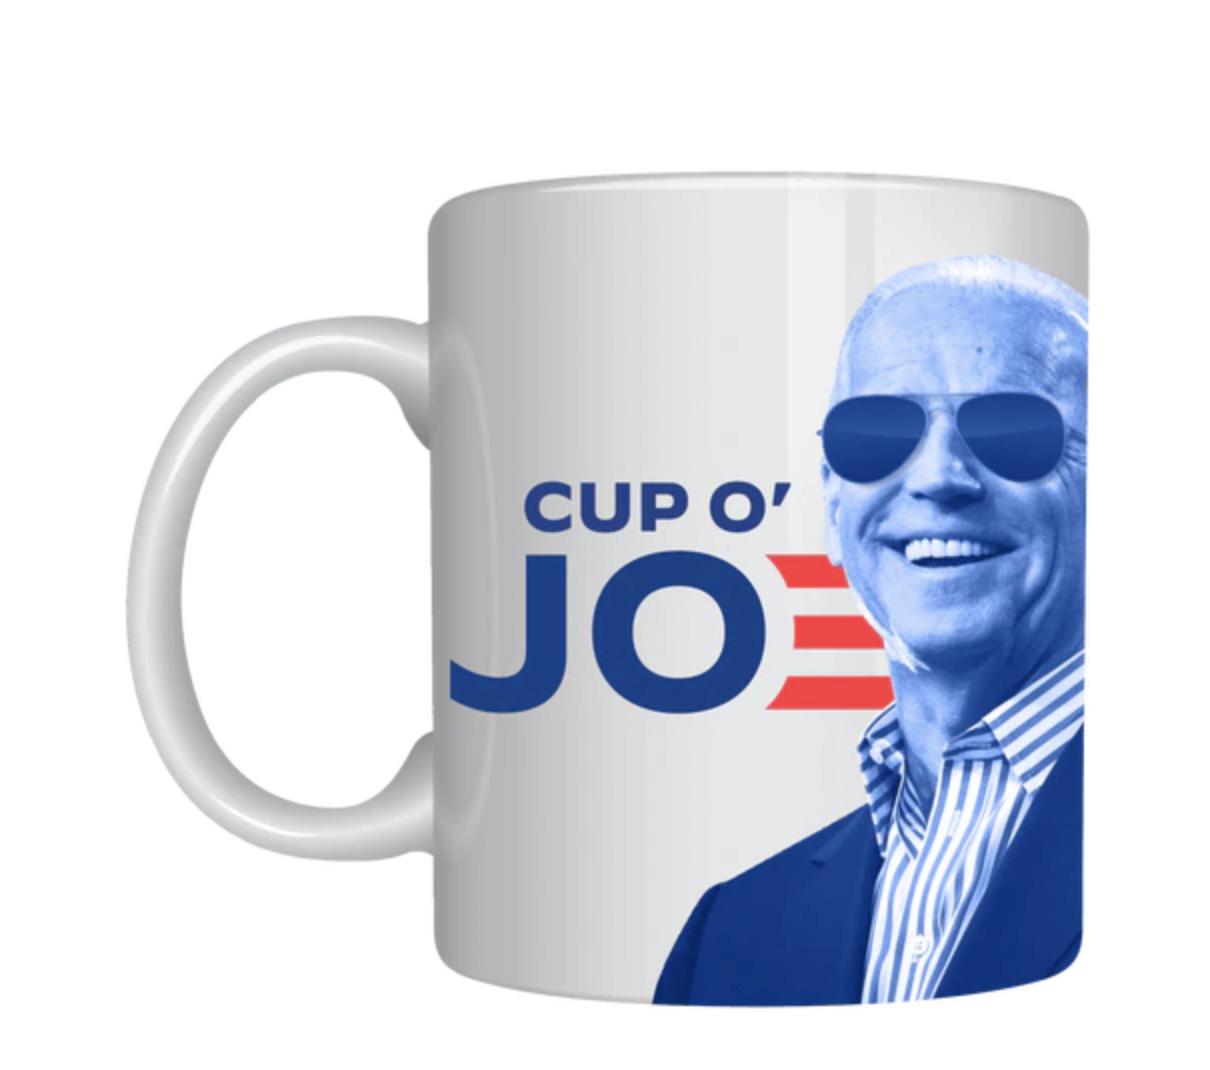 Cup o' Joe mug